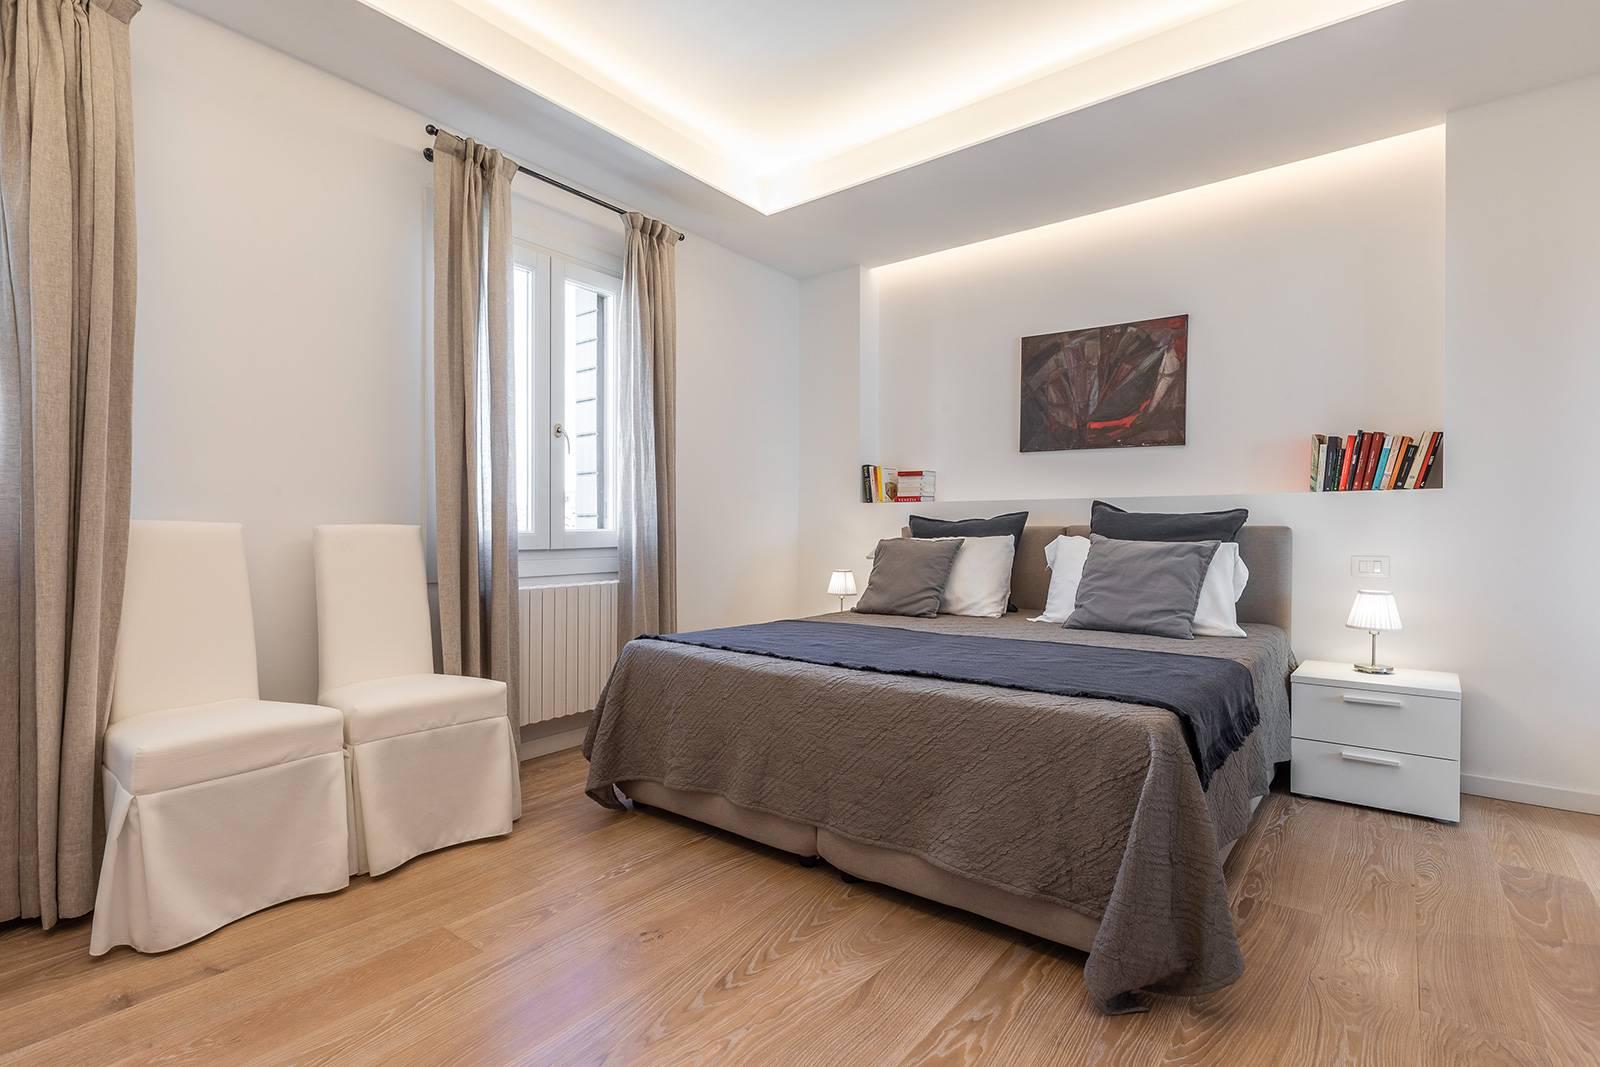 second bedroom with en-suite bathroom